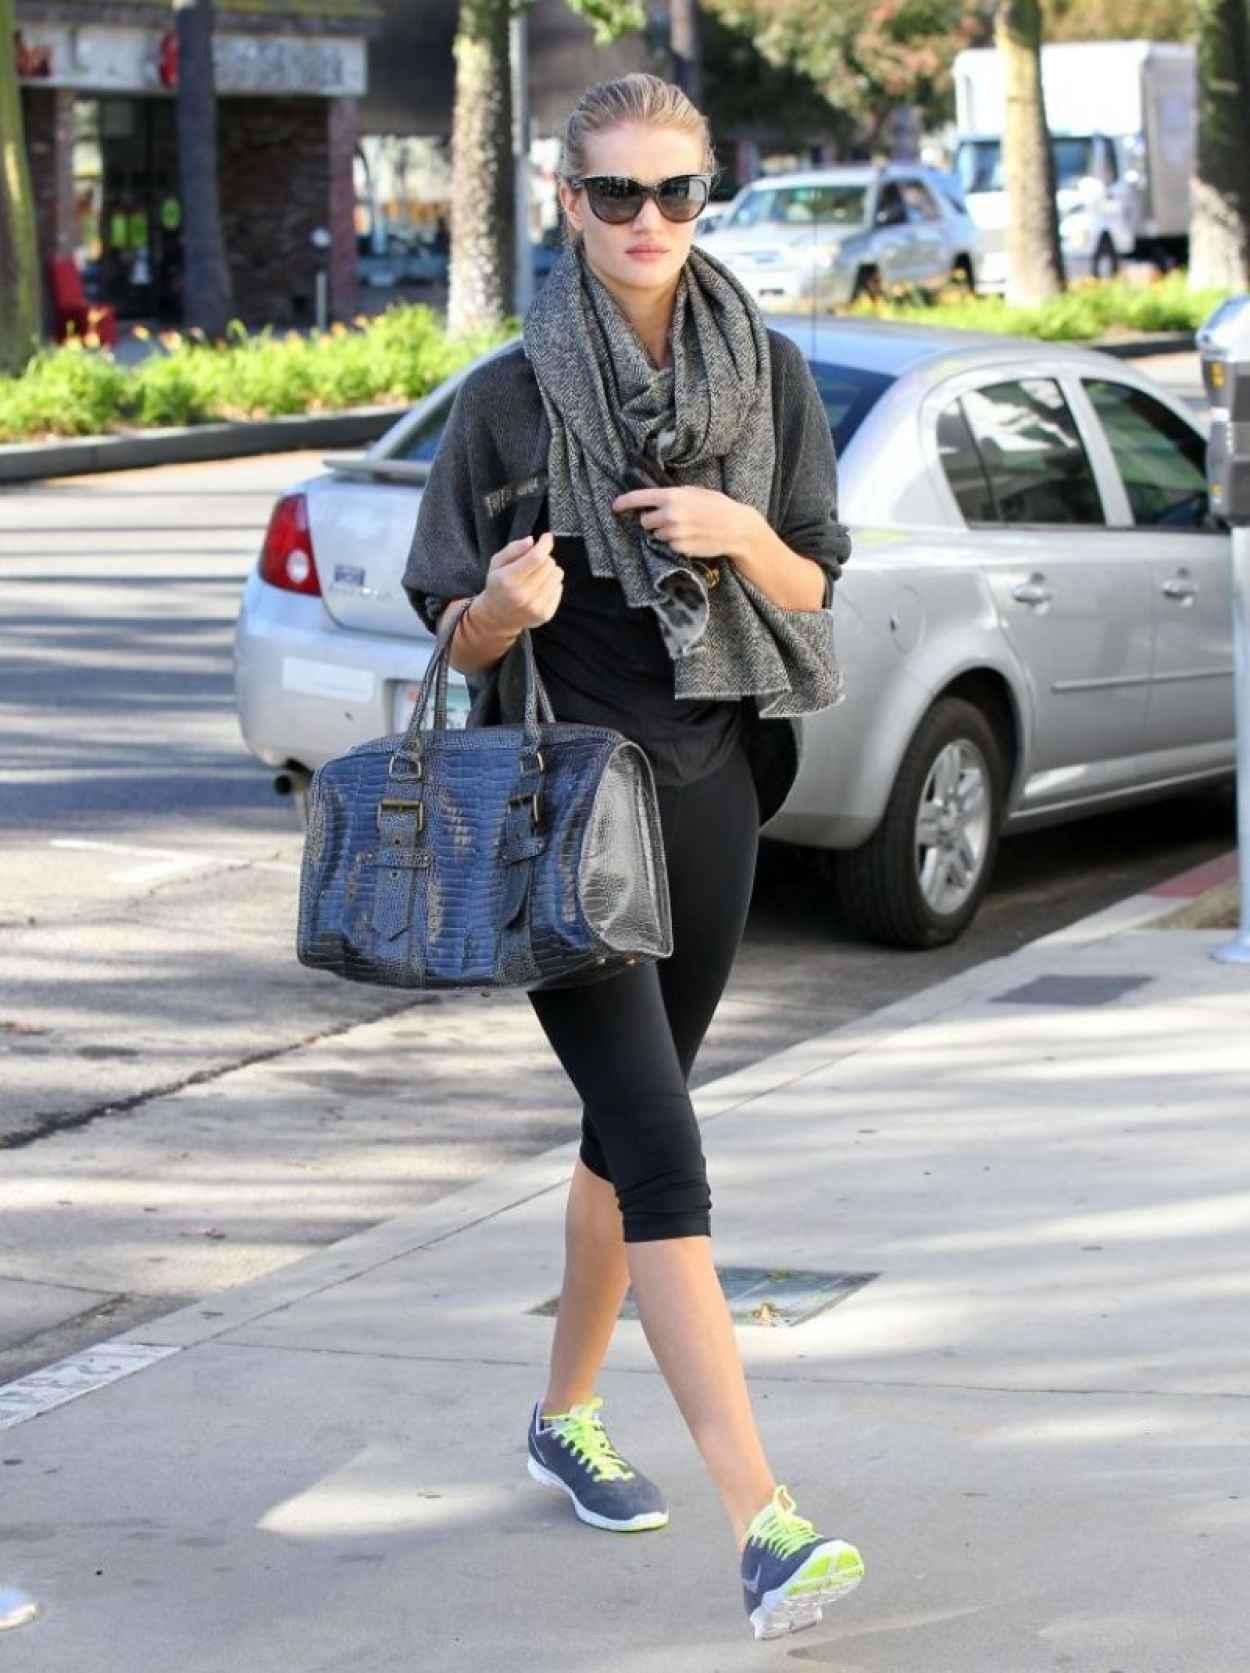 Rosie Huntington-Whiteley Street Style - Heads to the Gym-2